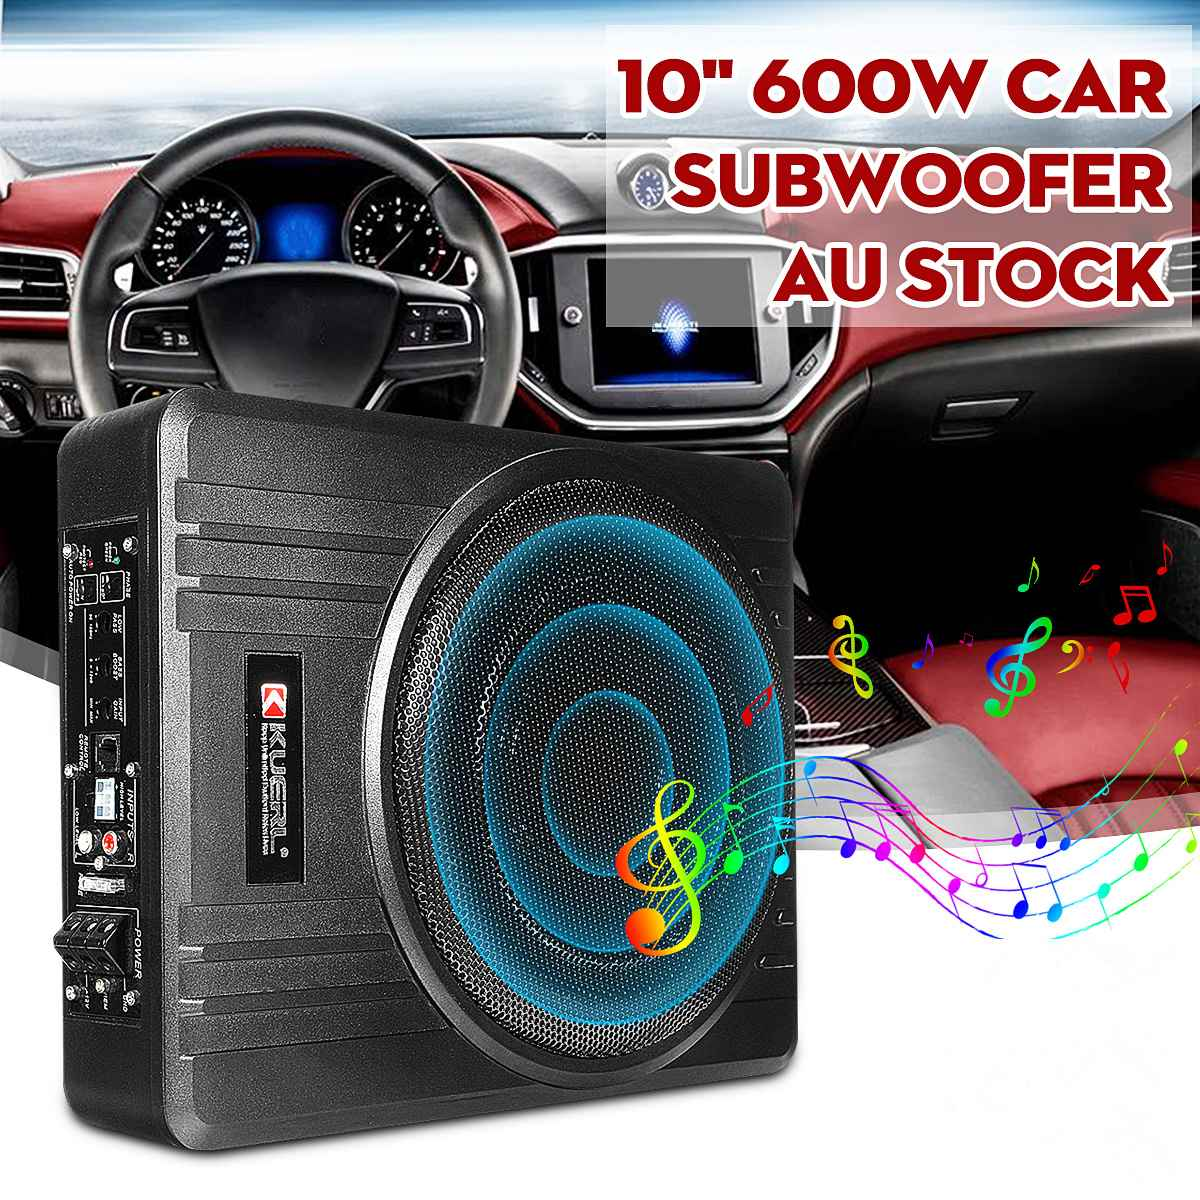 10 inç 600W araba Subwoofer araba ses altında ince koltuk aktif Subwoofer bas amplifikatör hoparlör araba amplifikatör Subwoofer Woofer